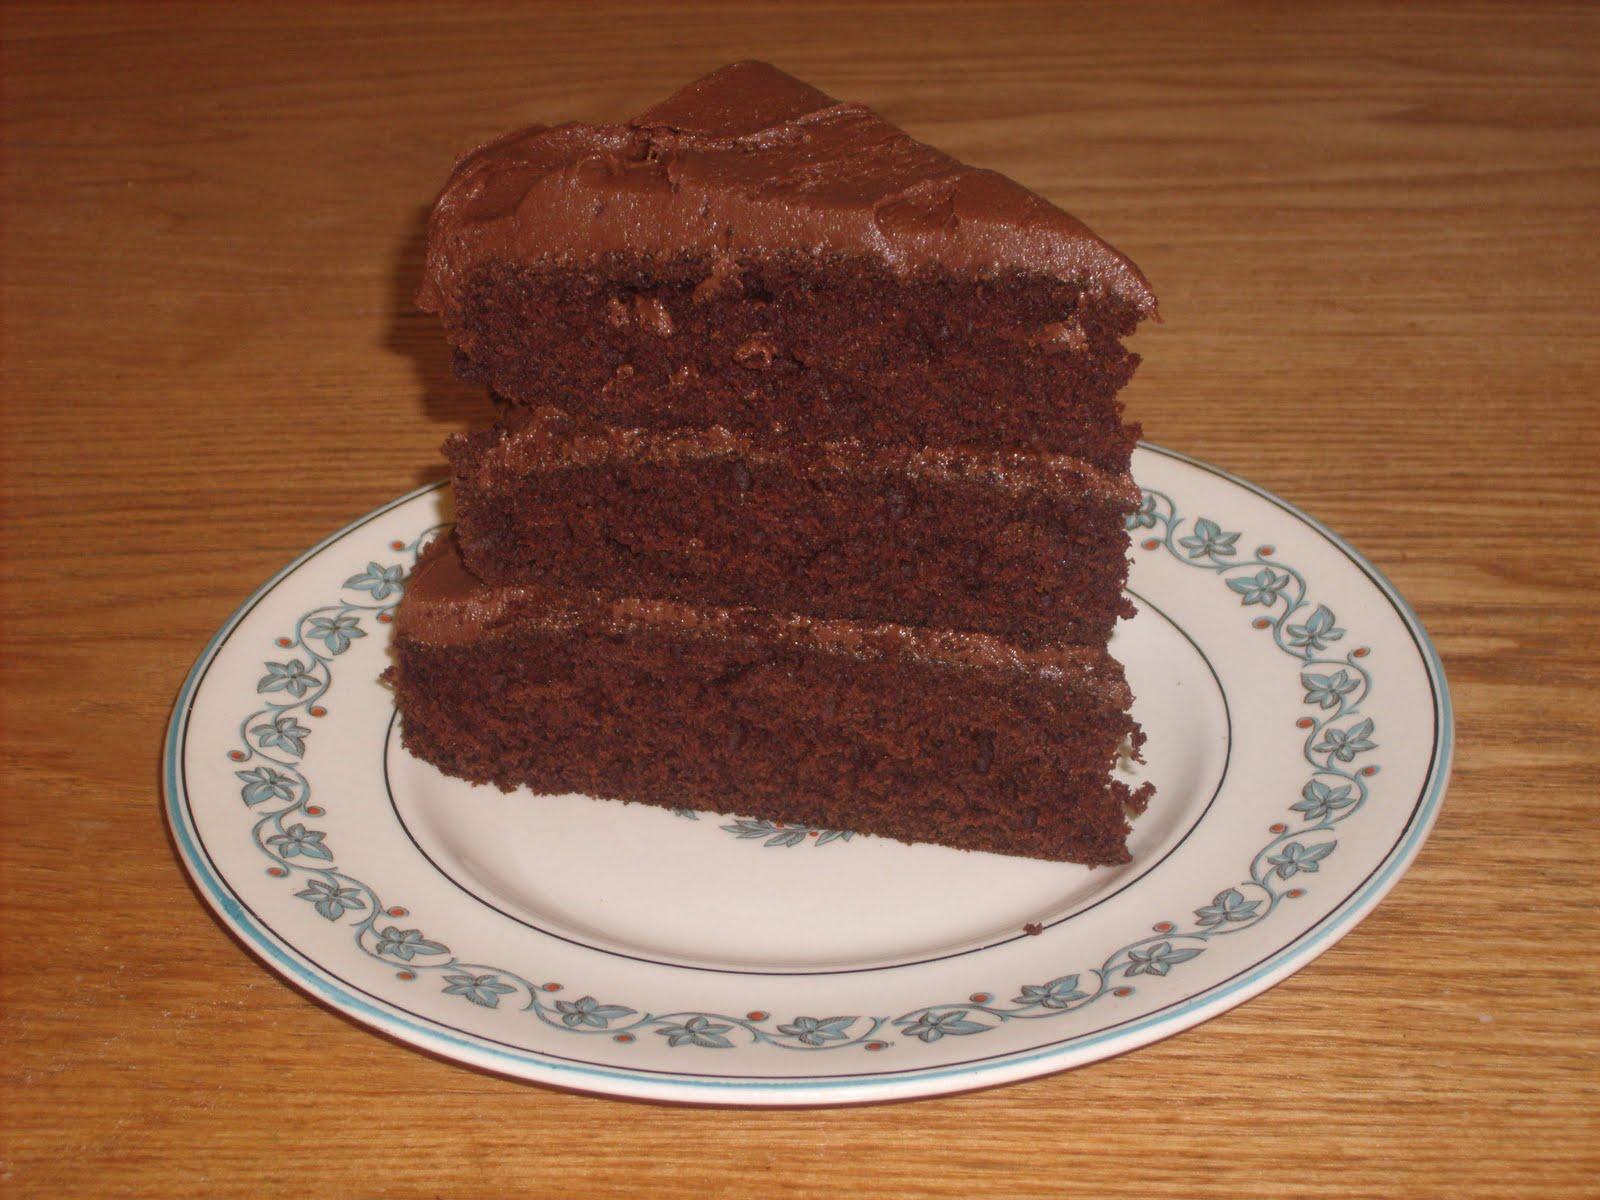 Gamers Fridge: Delicious Chocolate Cake